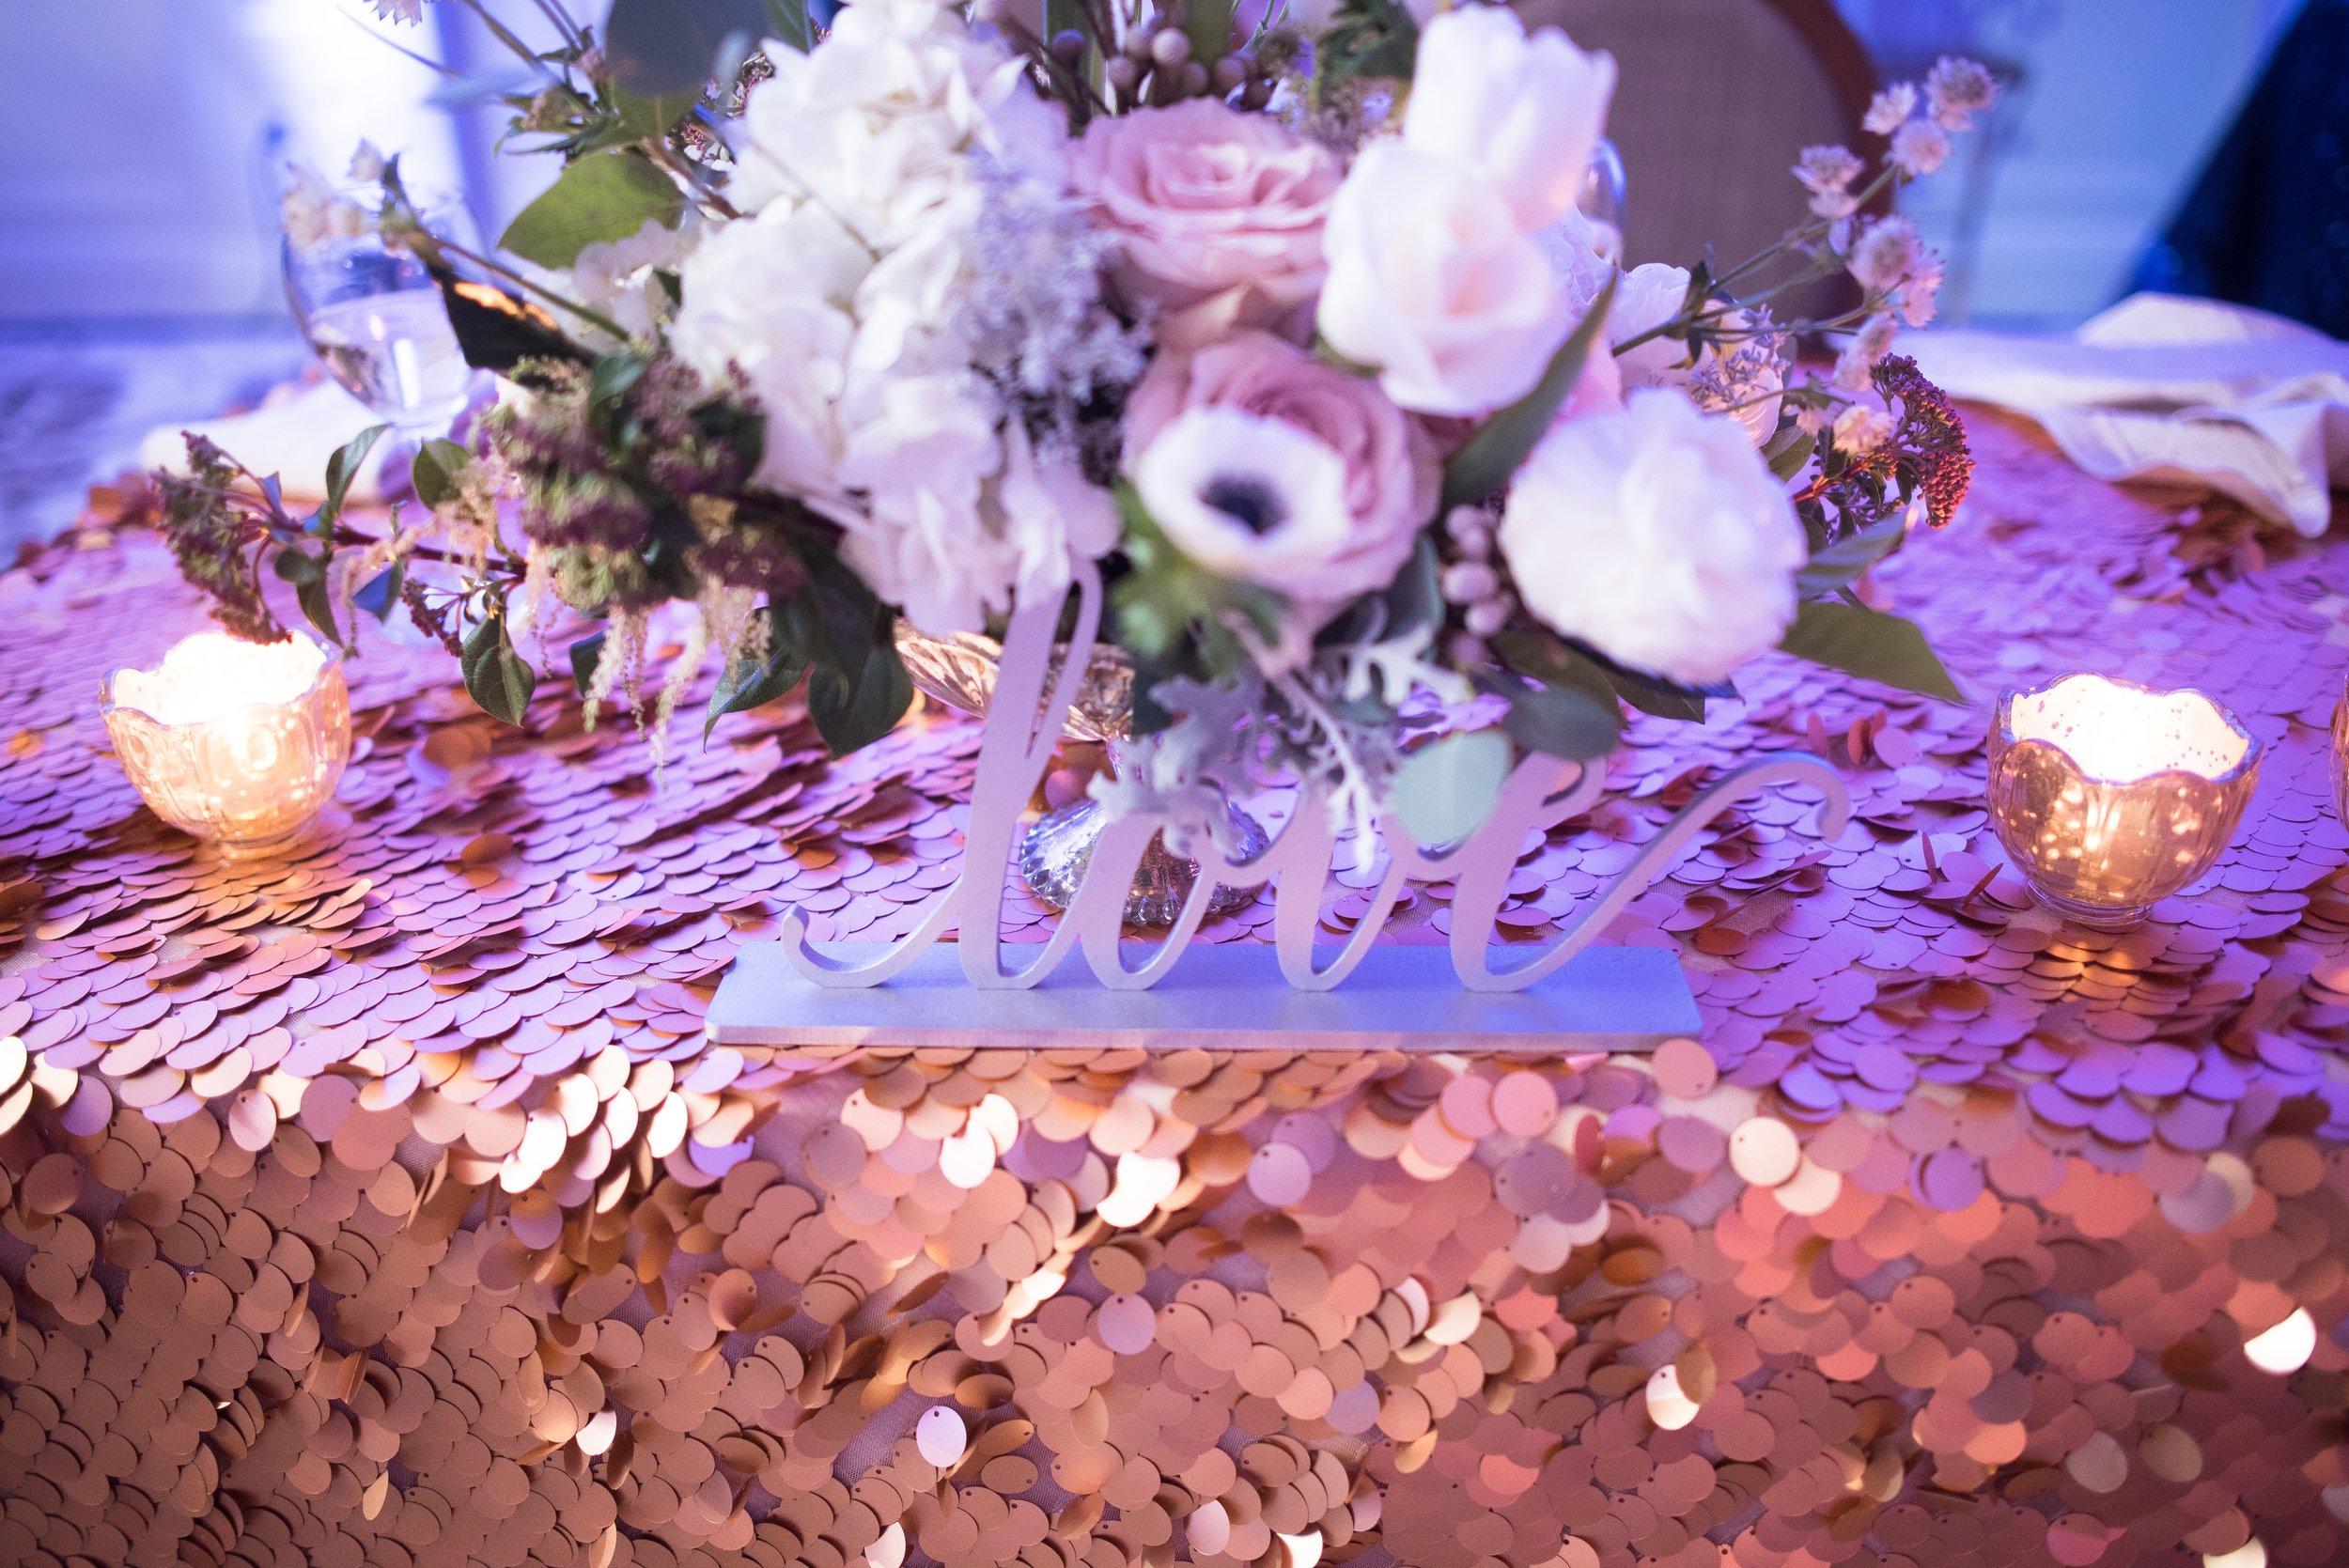 www.santabarbaraweddingstyle.com | San | Felici Events | Belmond El Encanto | Nate & Jenny Weddings | Precious and Blooming | Reception | Navy and Gold Wedding | Sweetheart Table